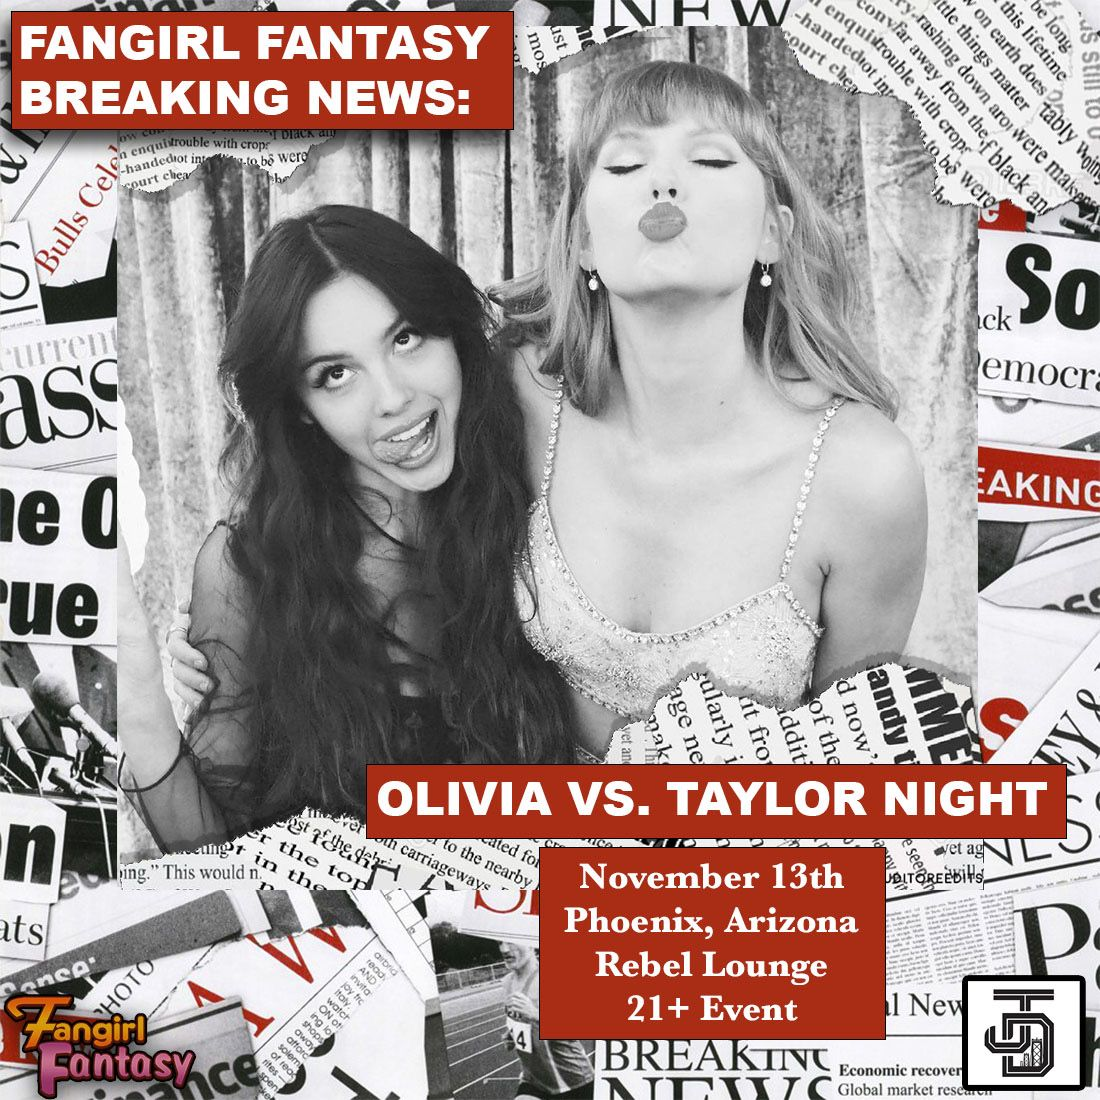 OLIVIA VS. TAYLOR NIGHT: